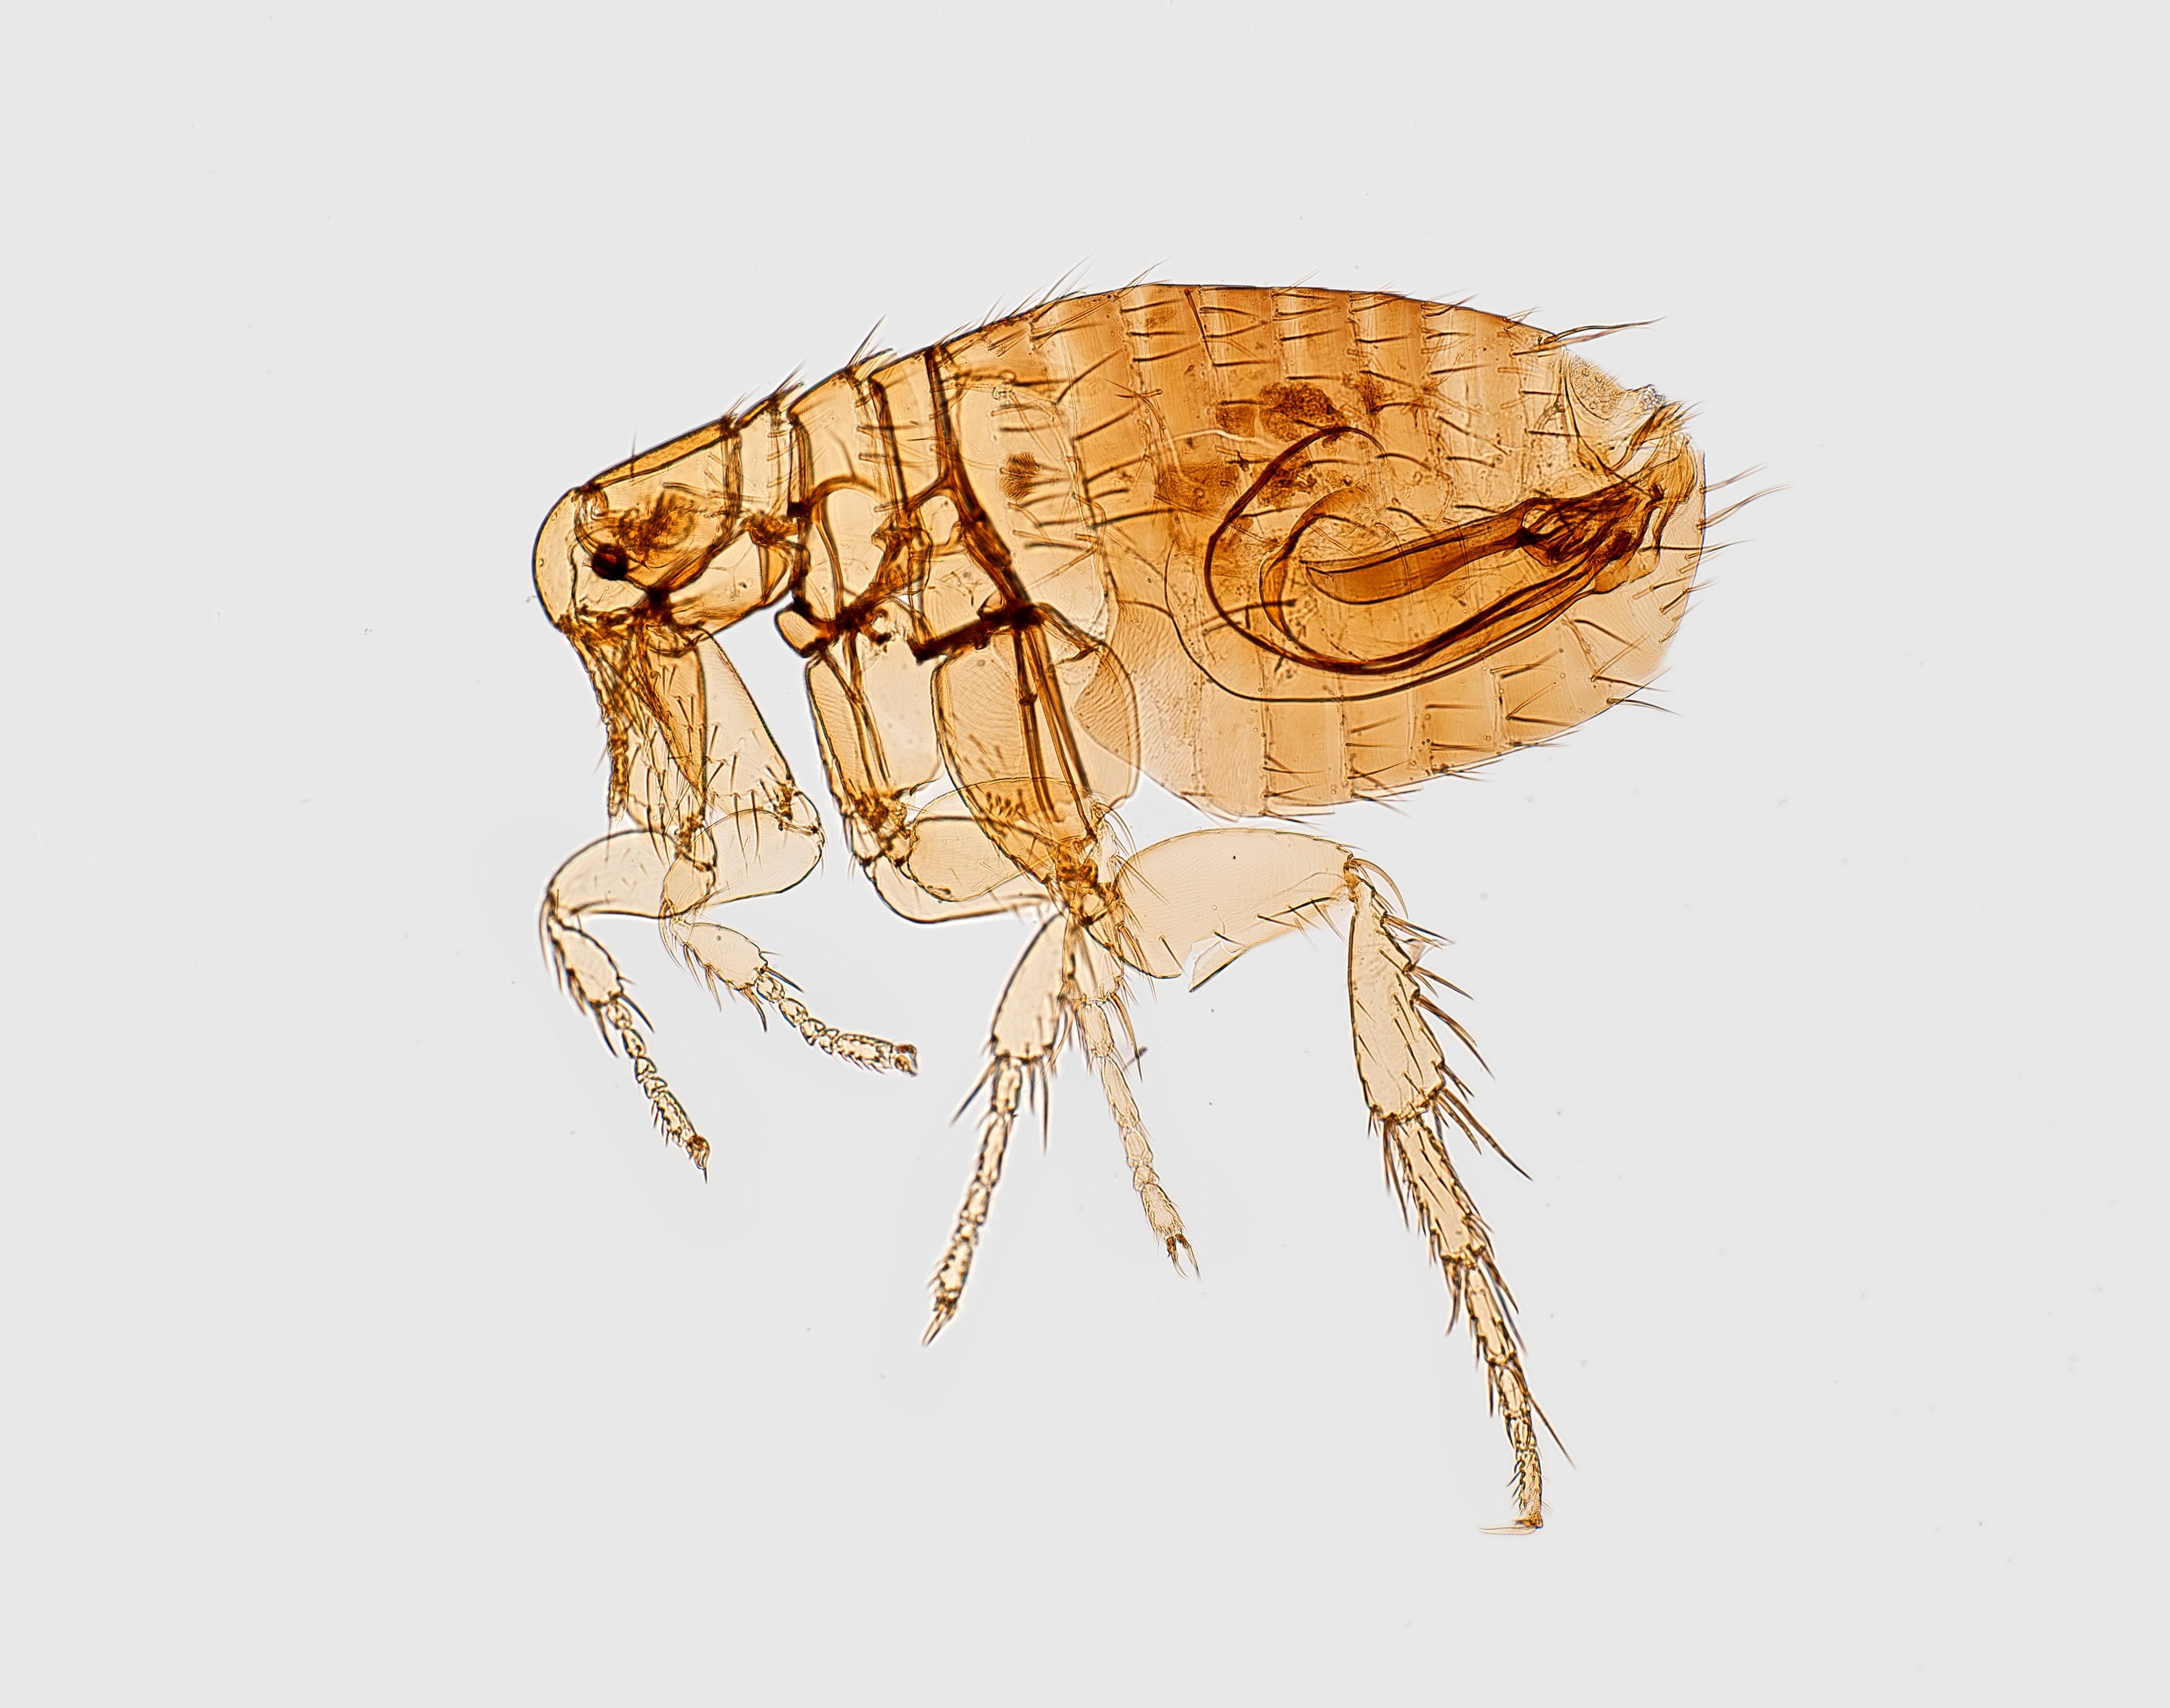 A common flea insect